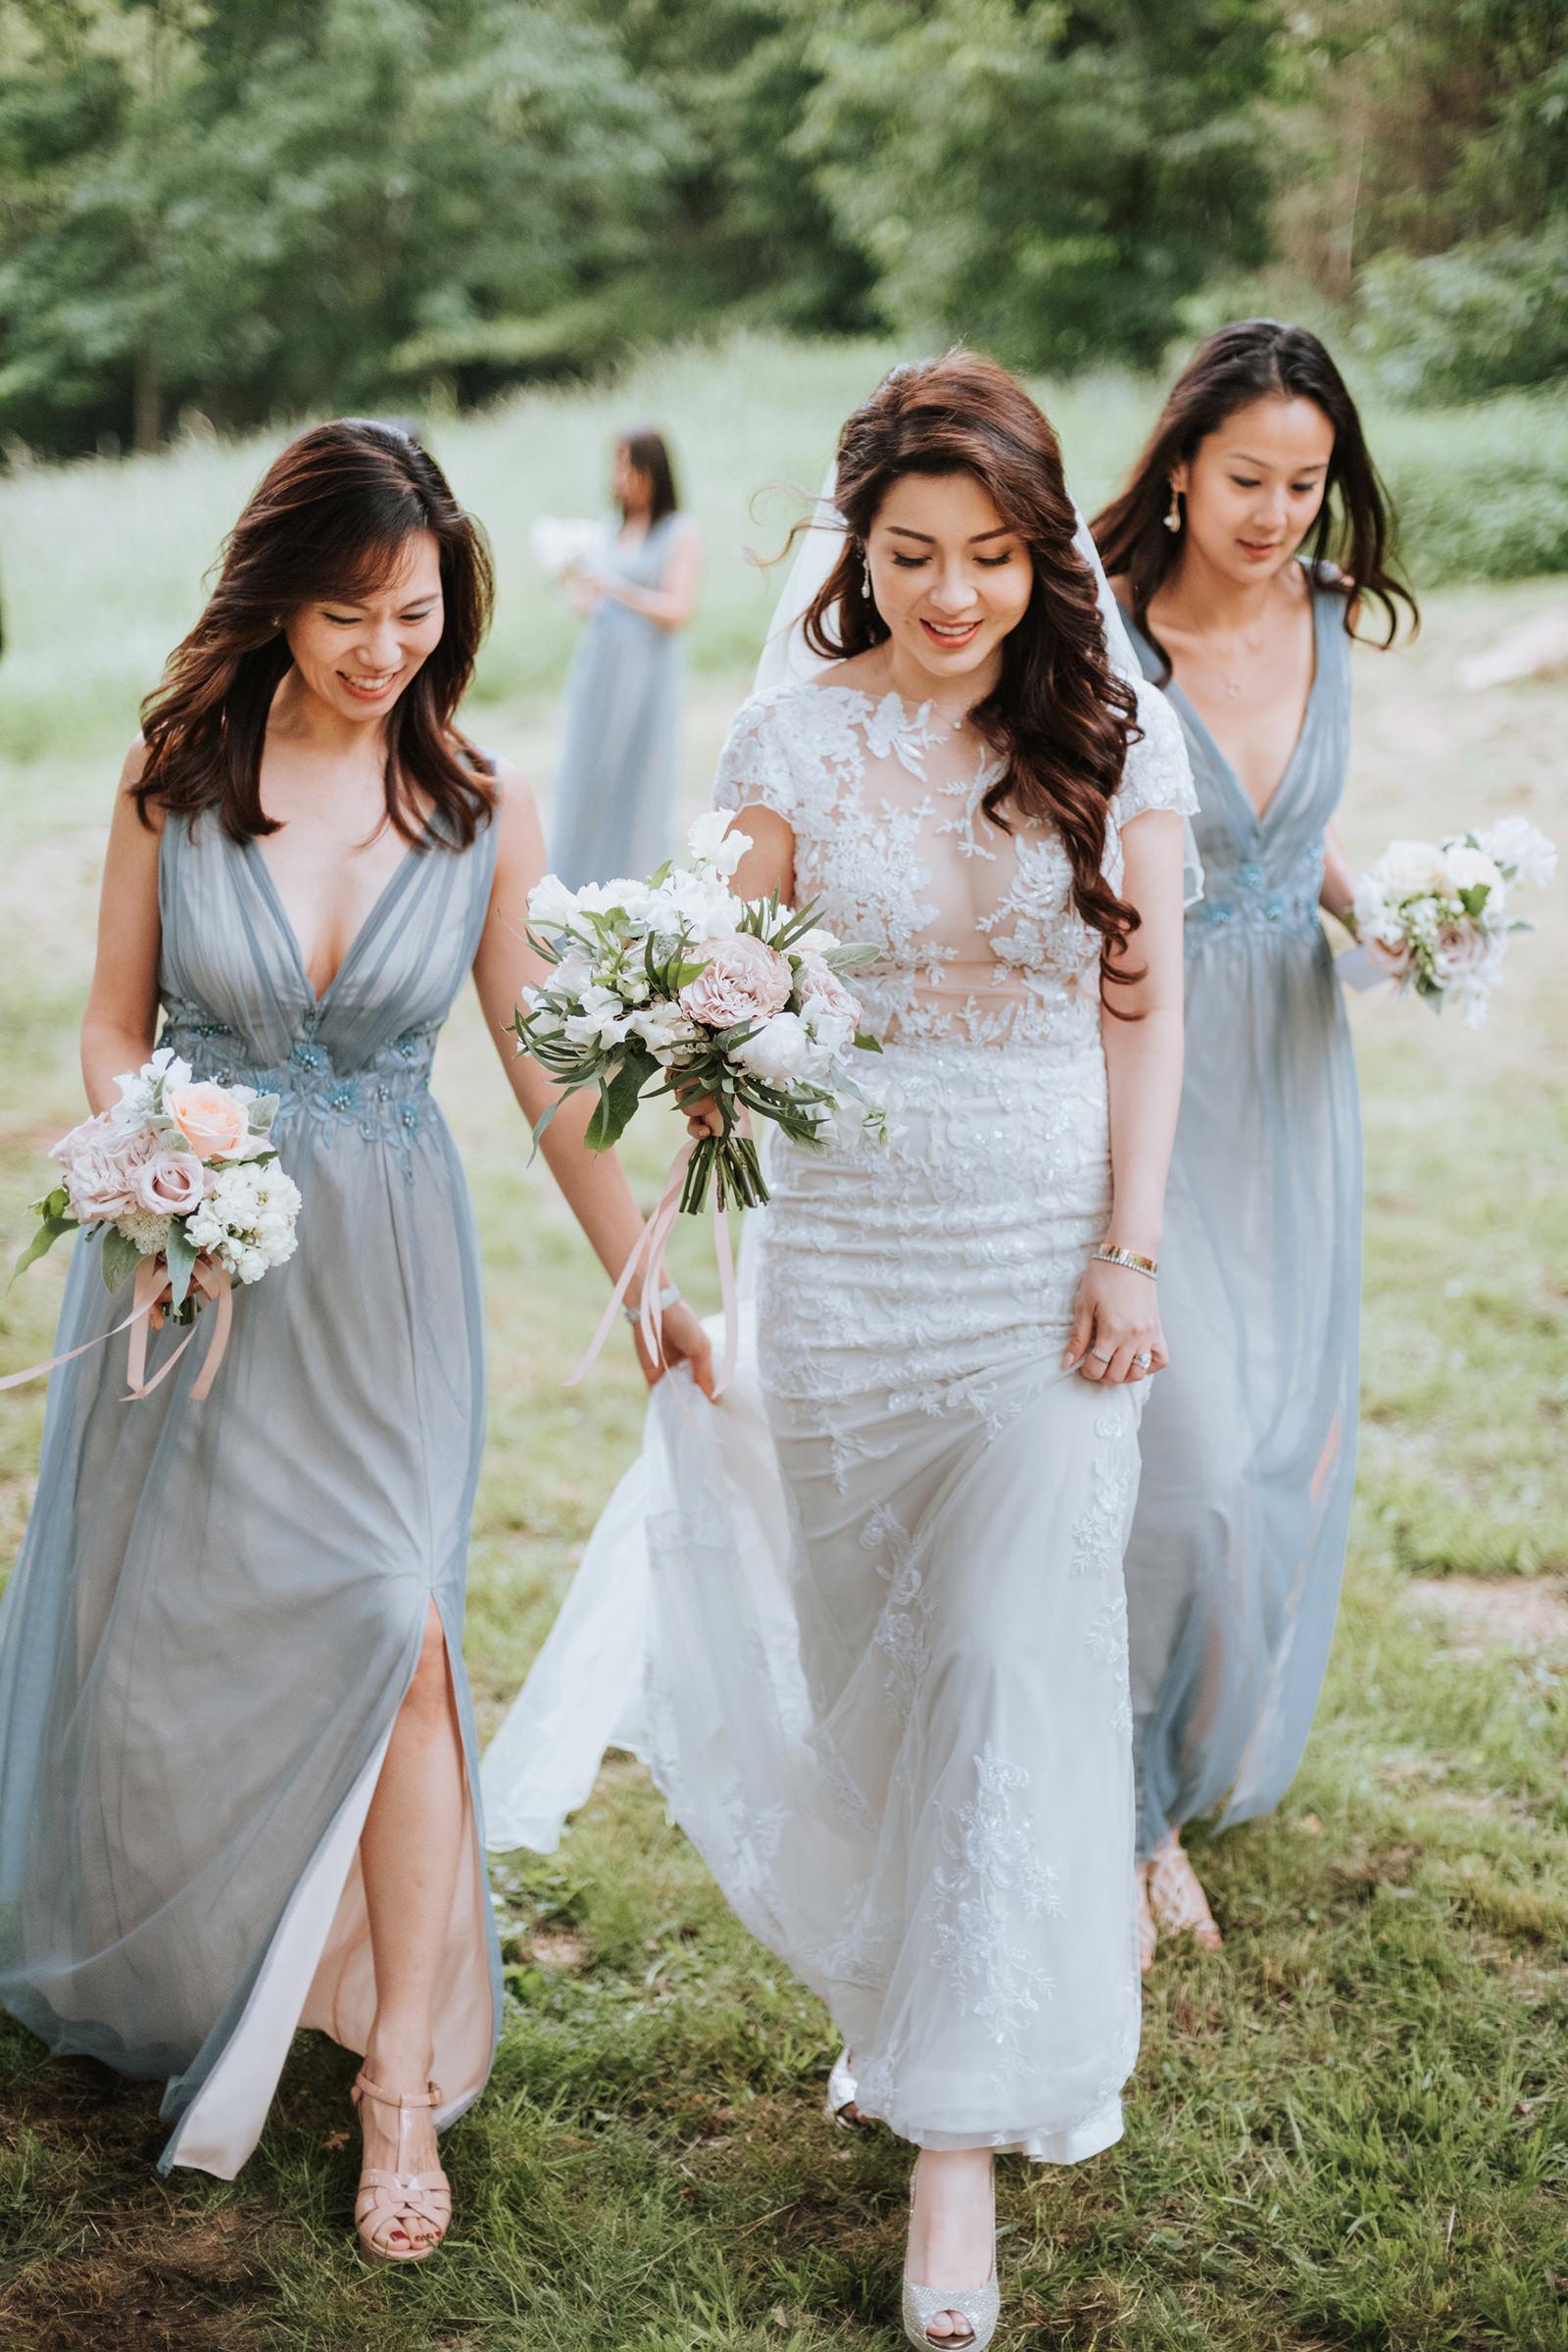 Bride walking with bridesmaids- photo by Mun Keat Studio